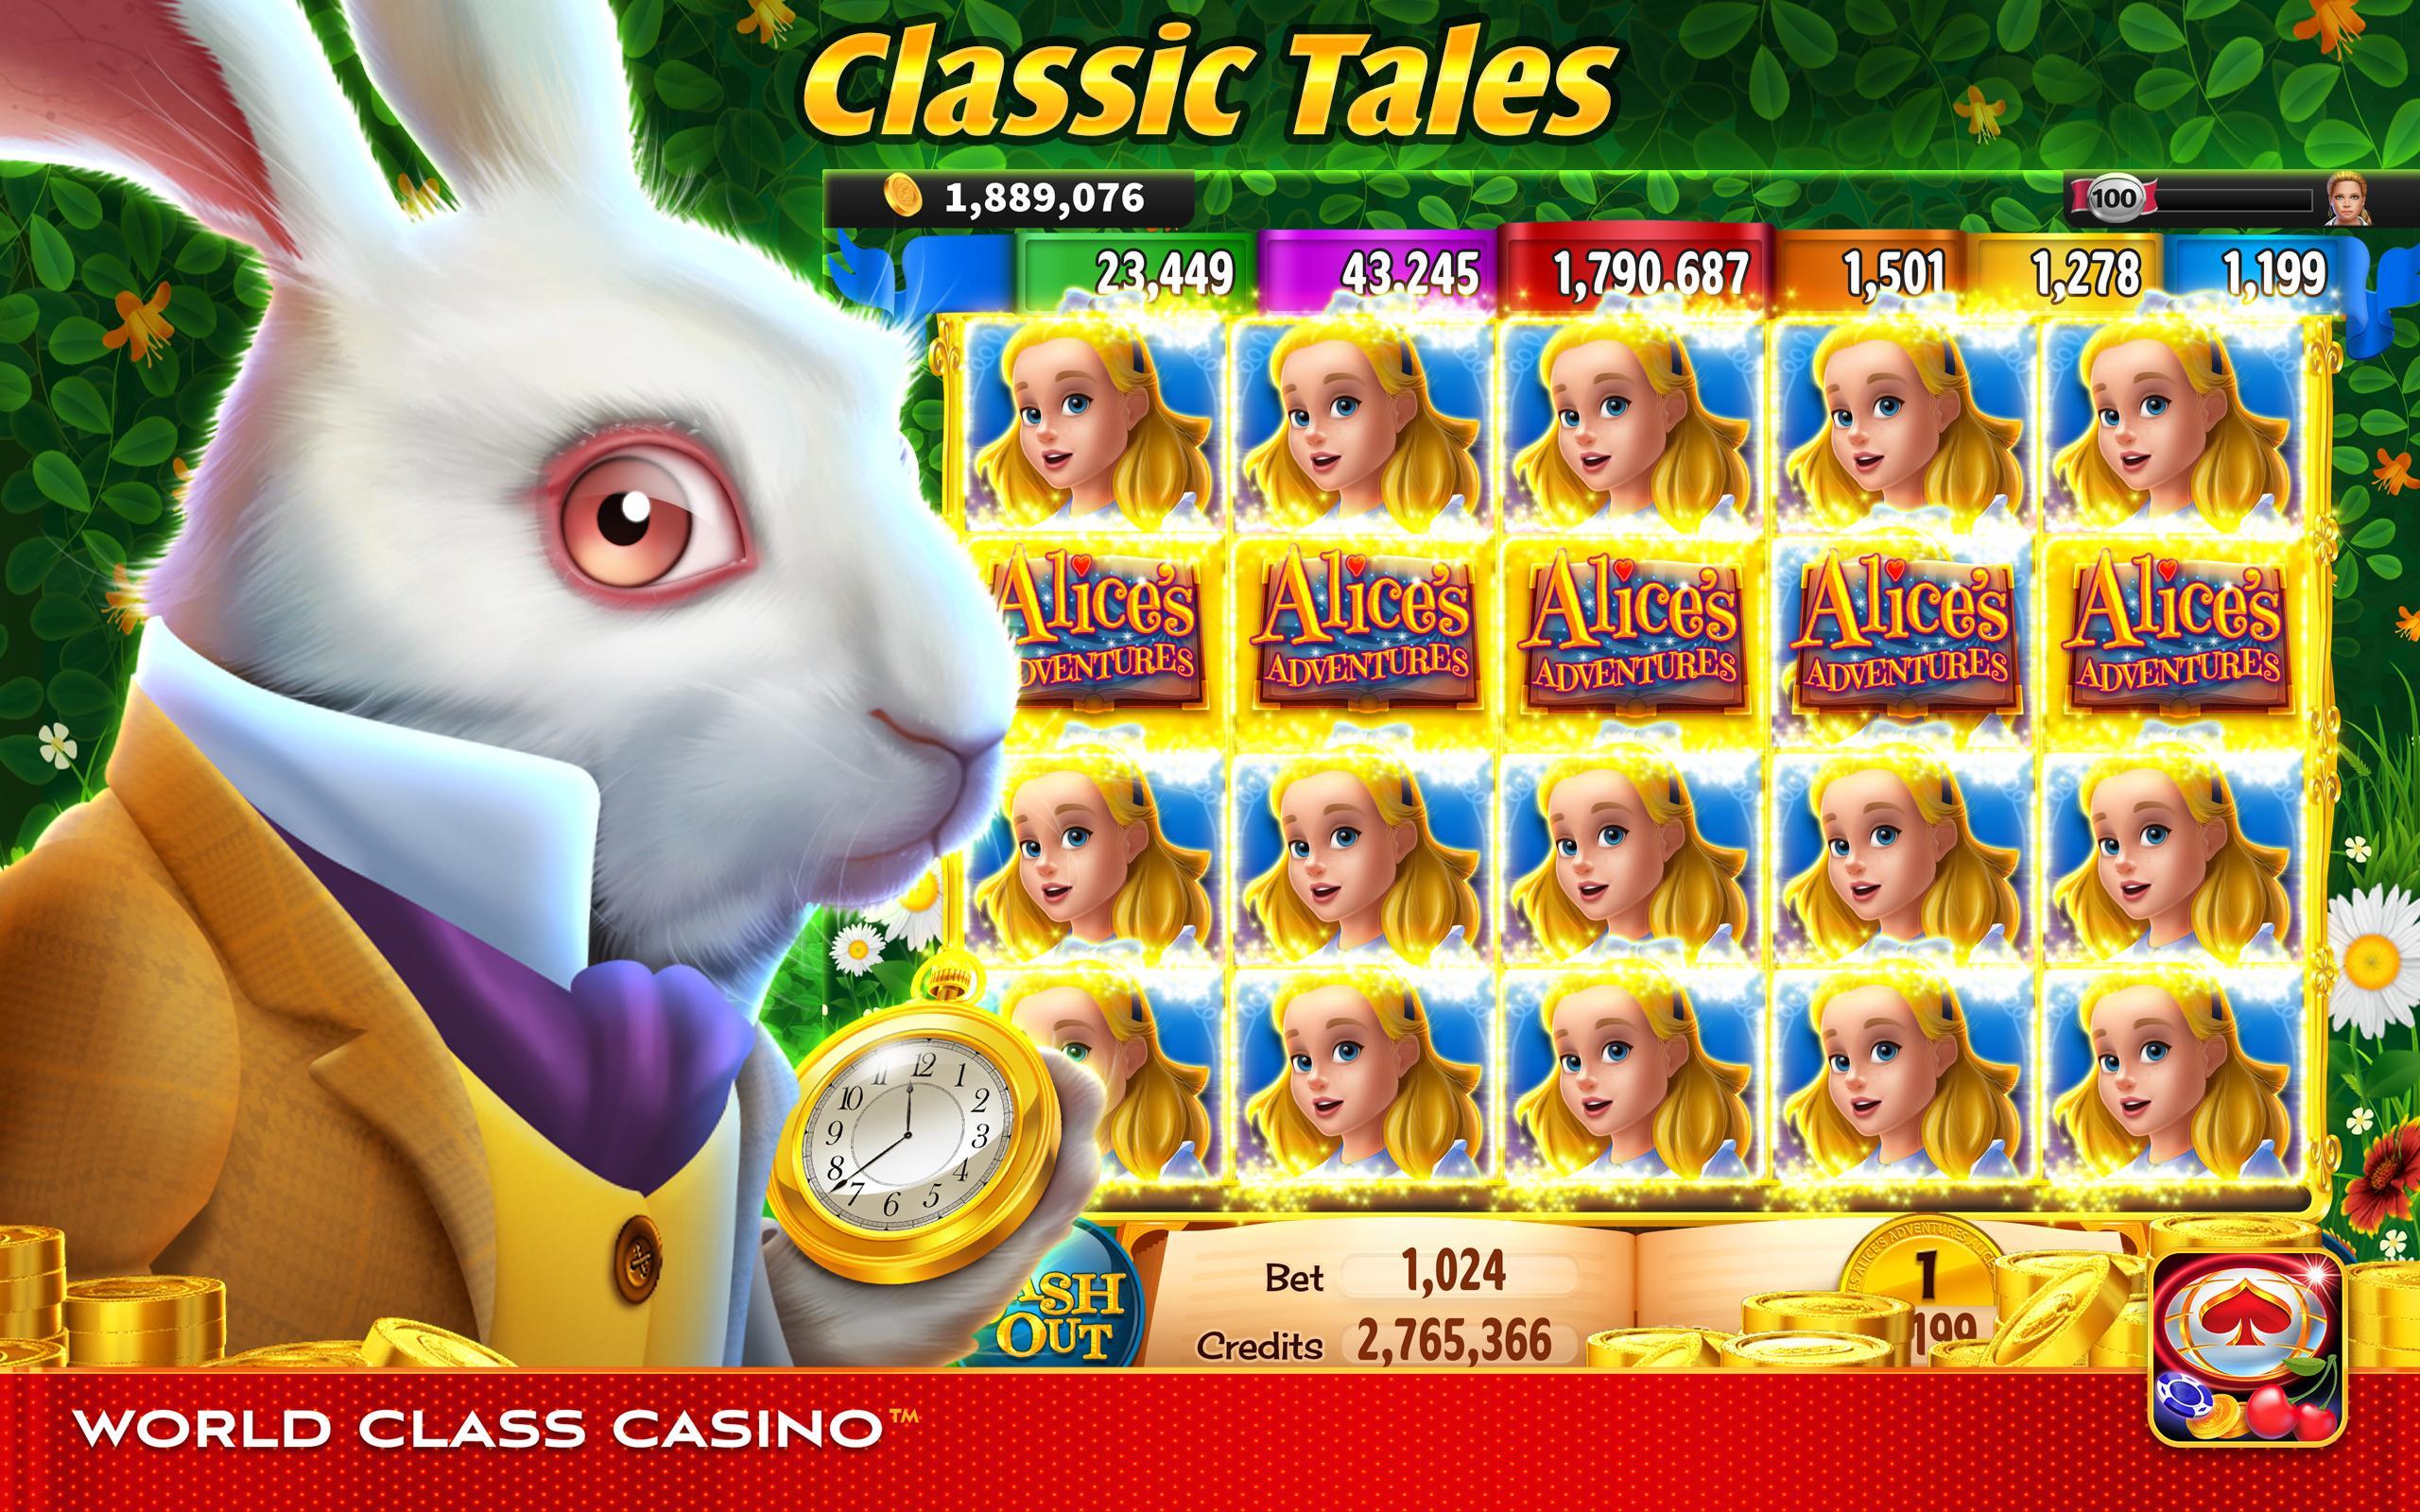 World Class Casino Slots, Blackjack & Poker Room 8.0.4 Screenshot 10